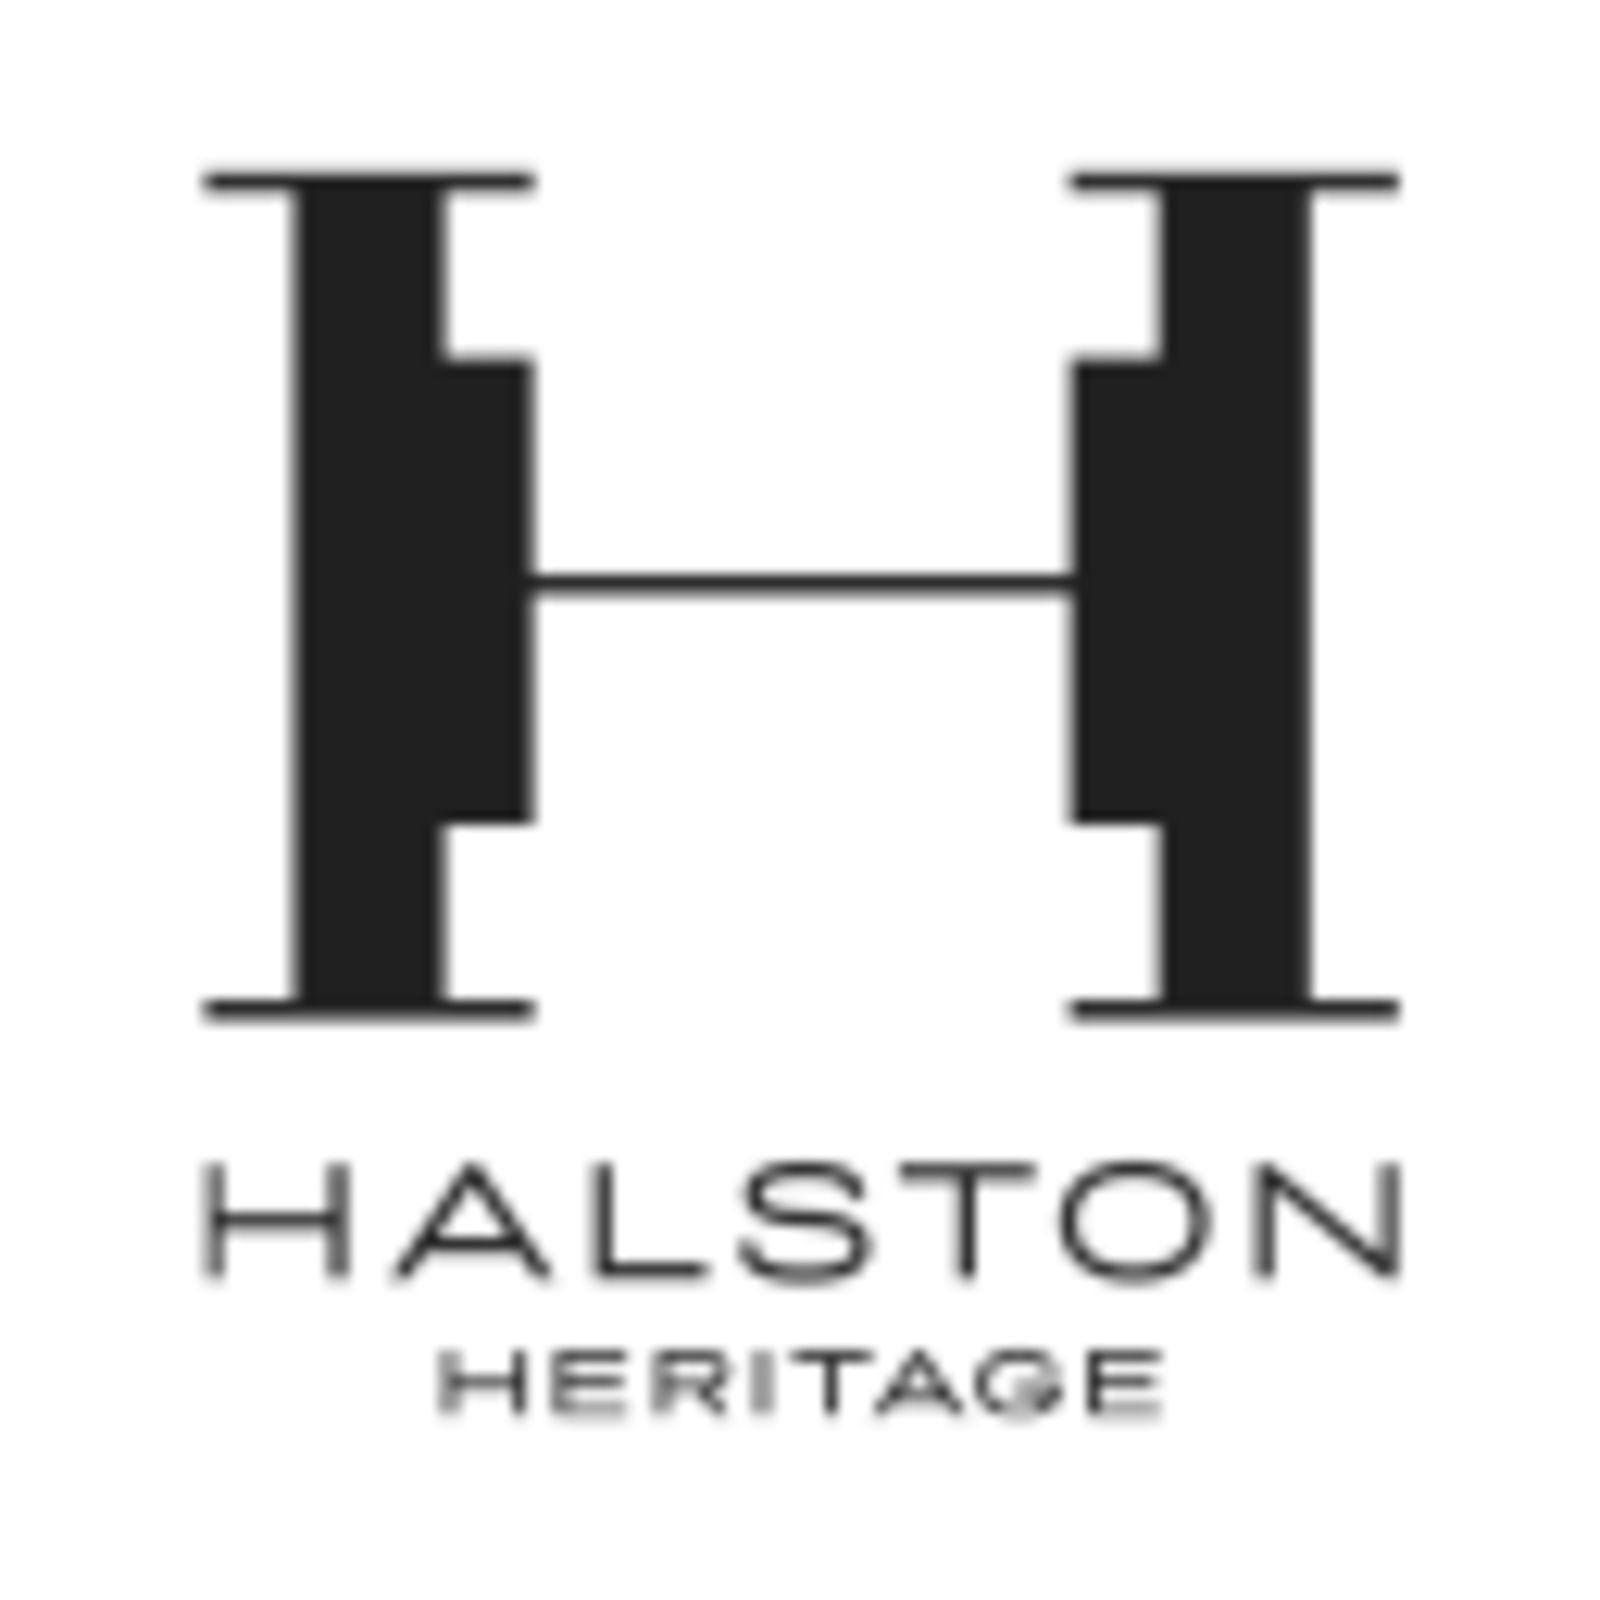 HALSTON HERITAGE (Bild 1)